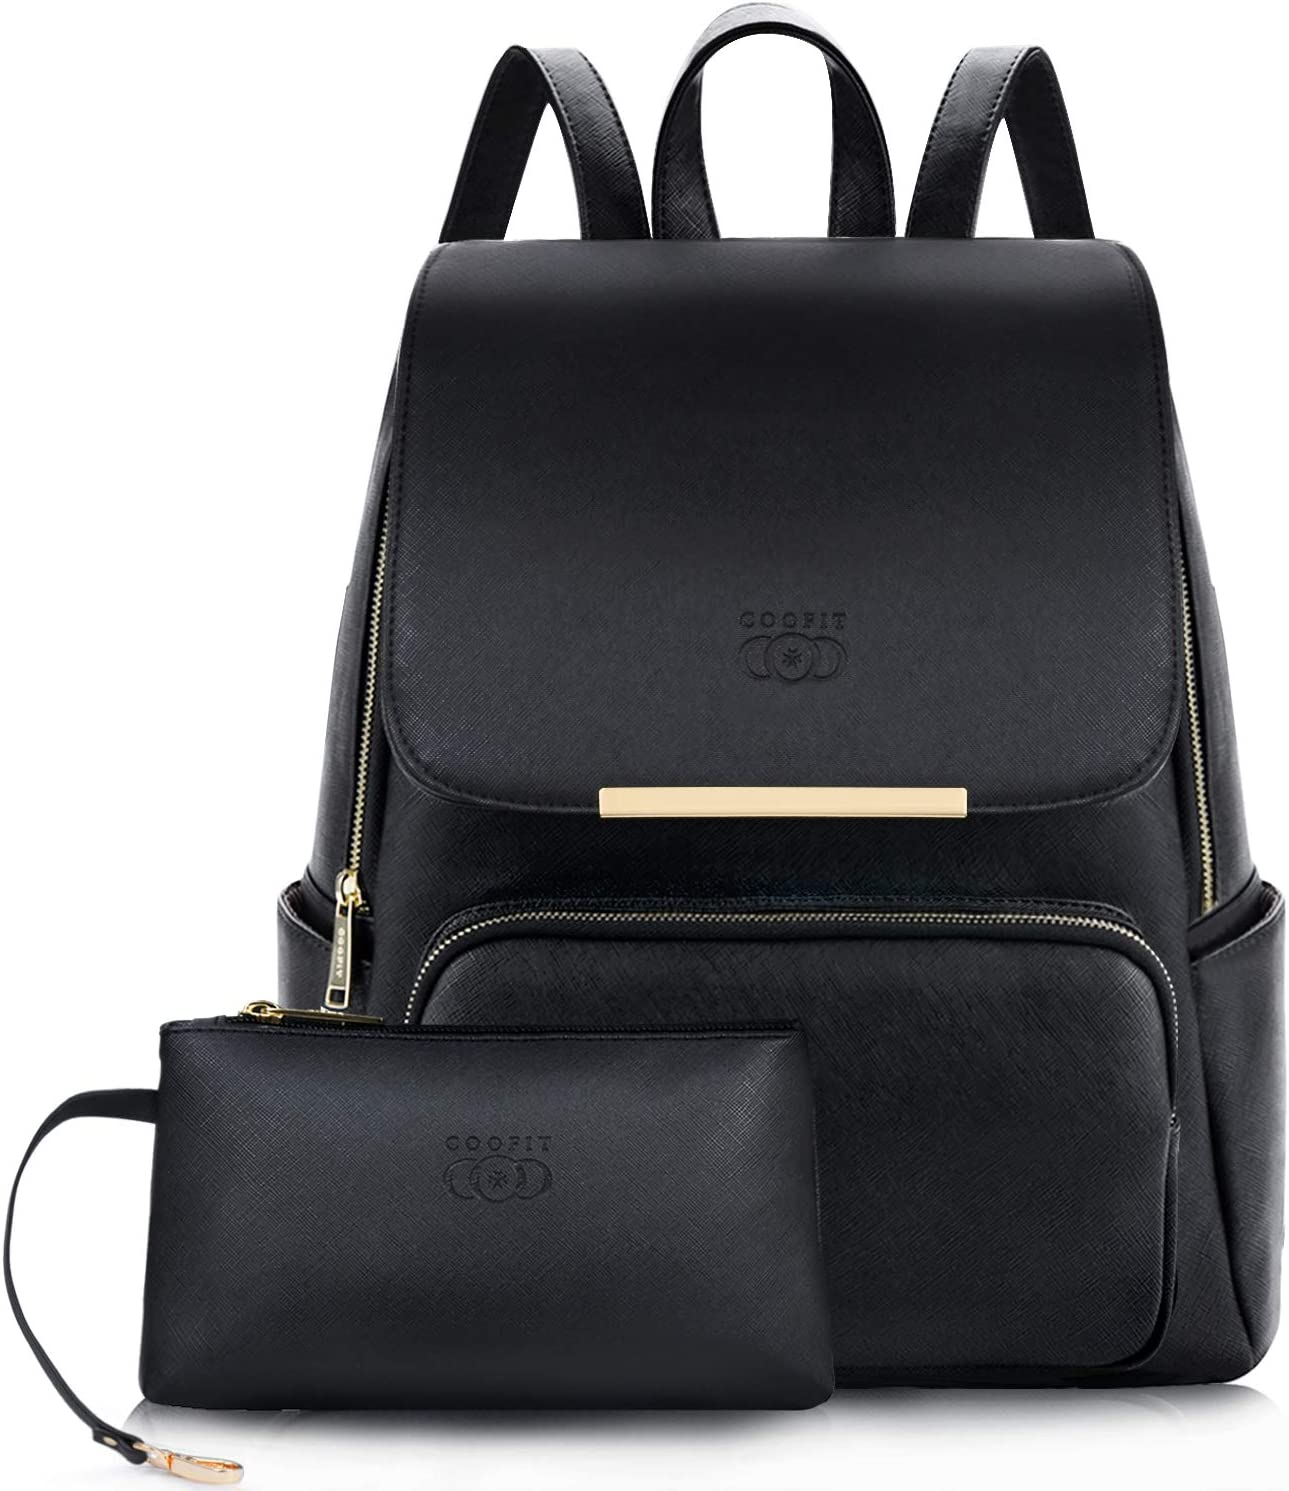 Damen Rucksack - Rucksack Tasche Damen